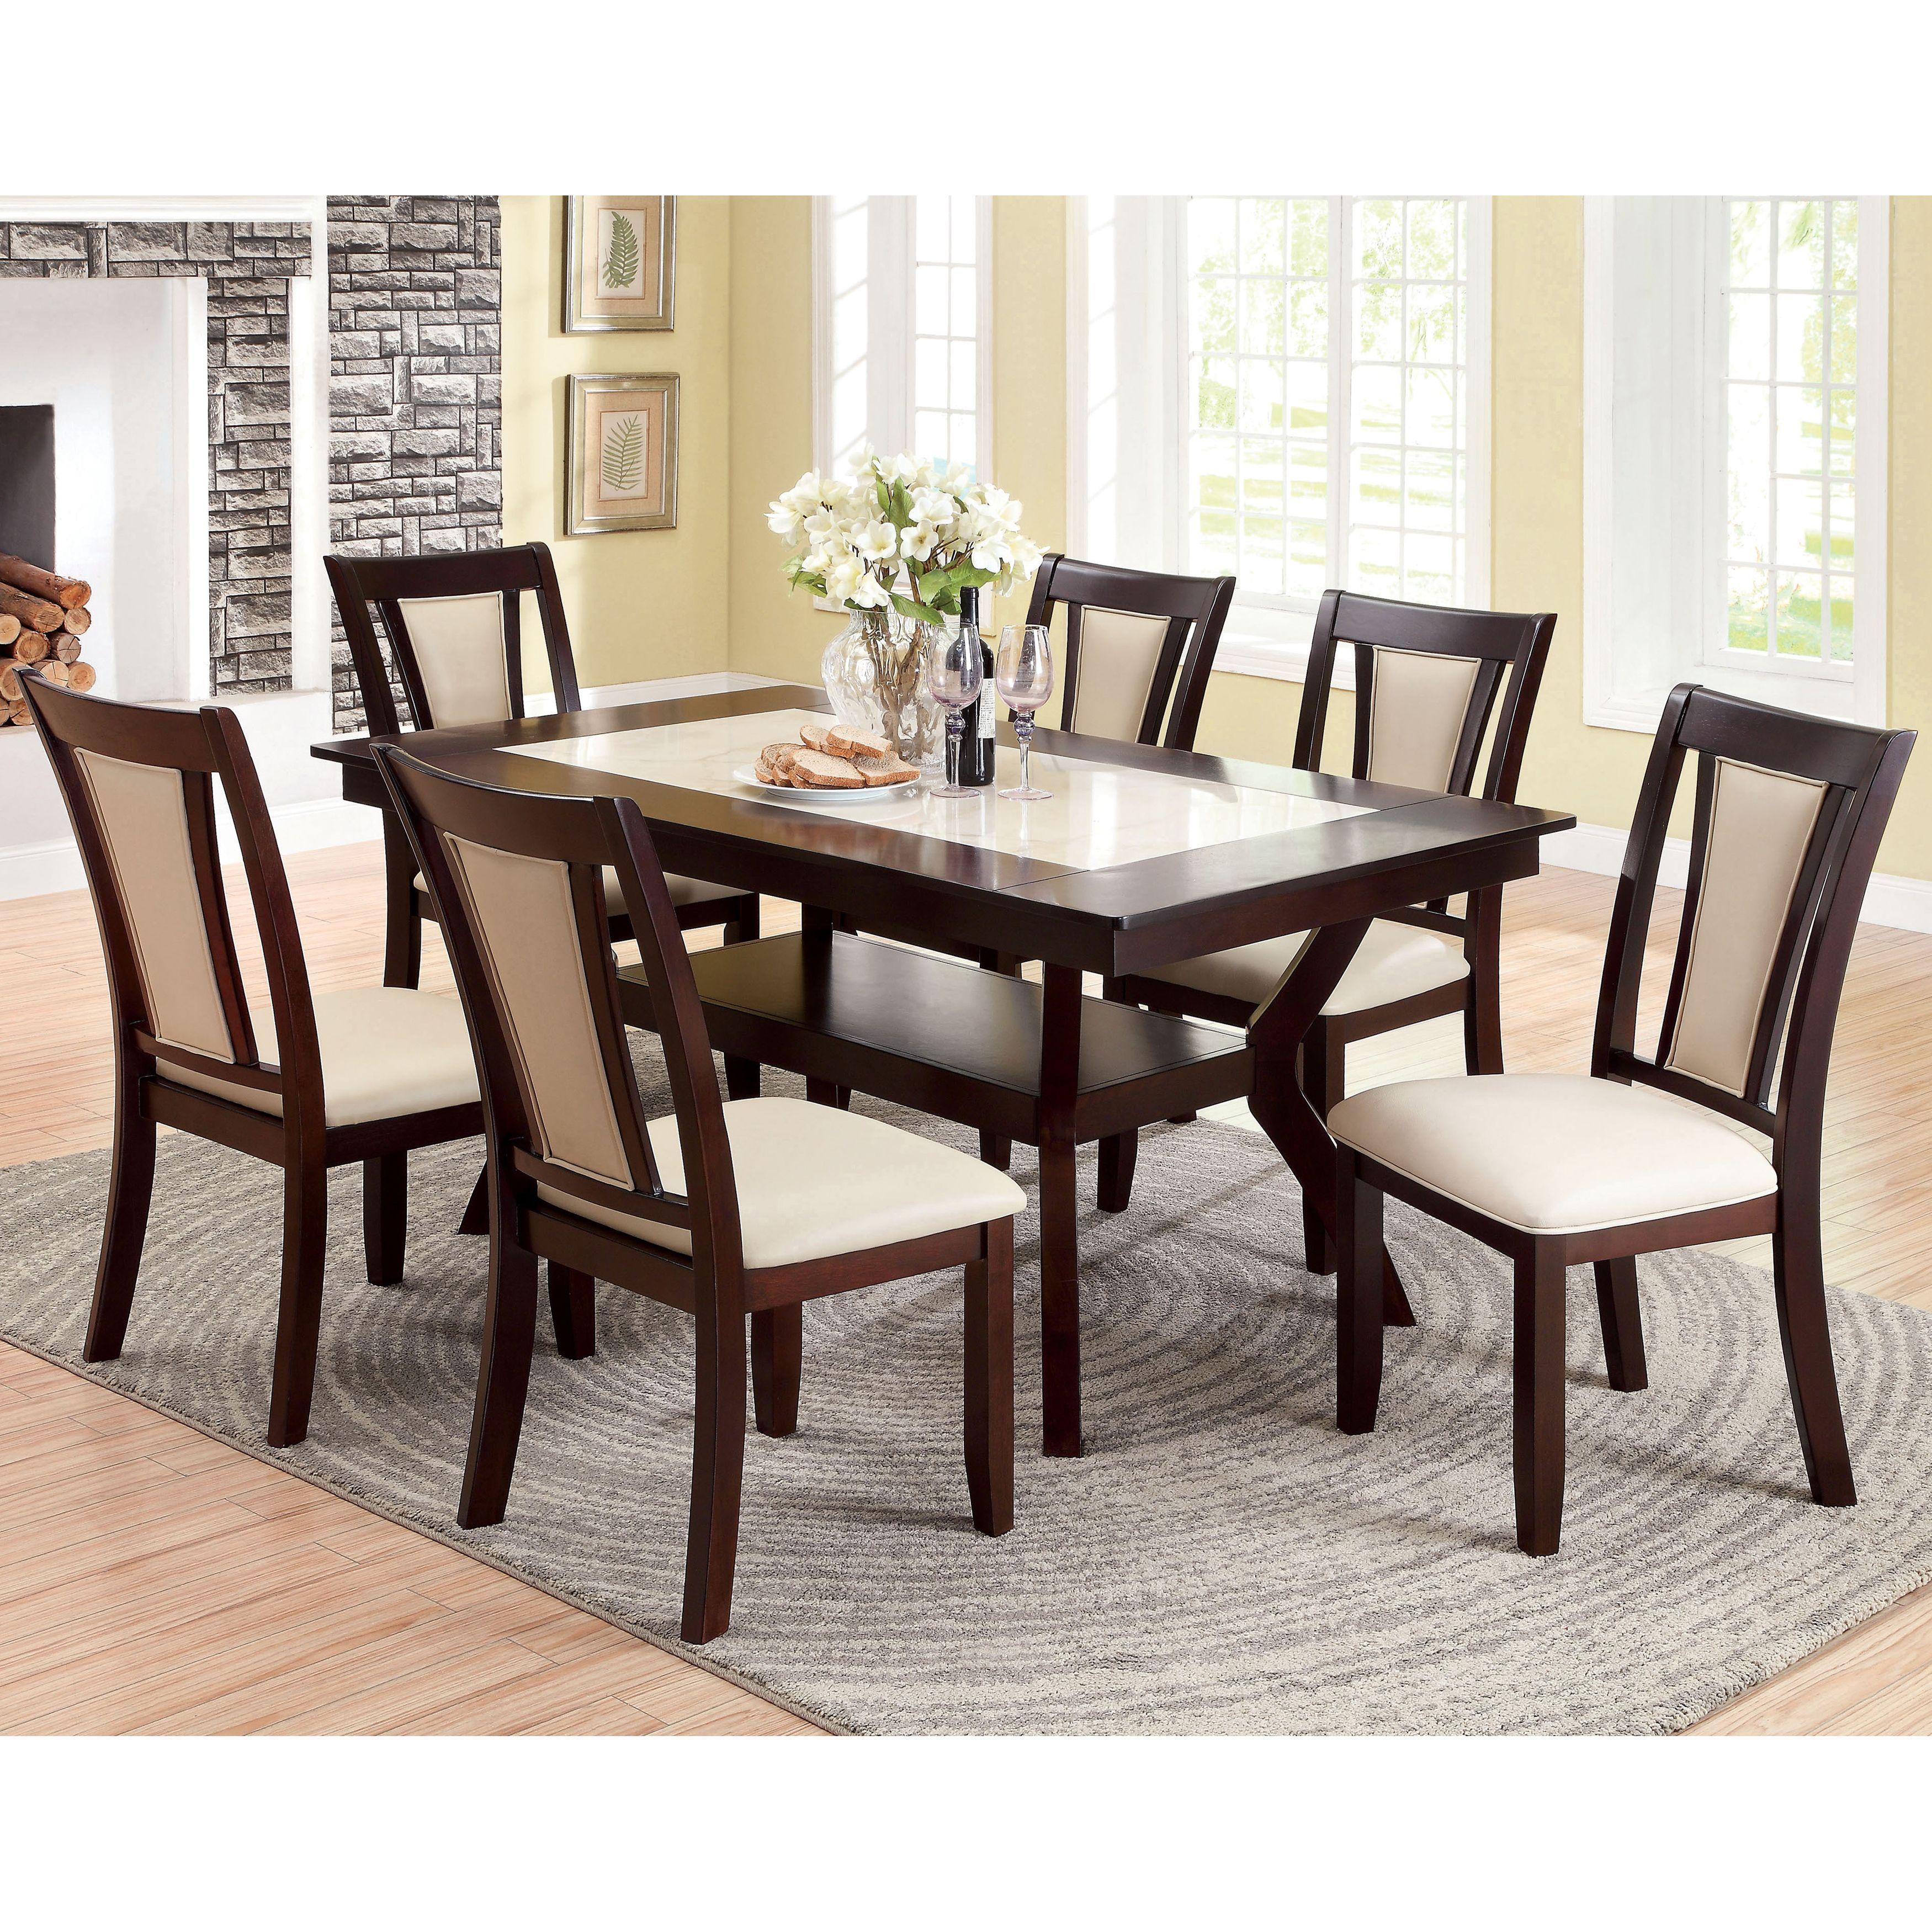 Furniture Of America Kateria Dark Cherry 7 Piece Dining Set